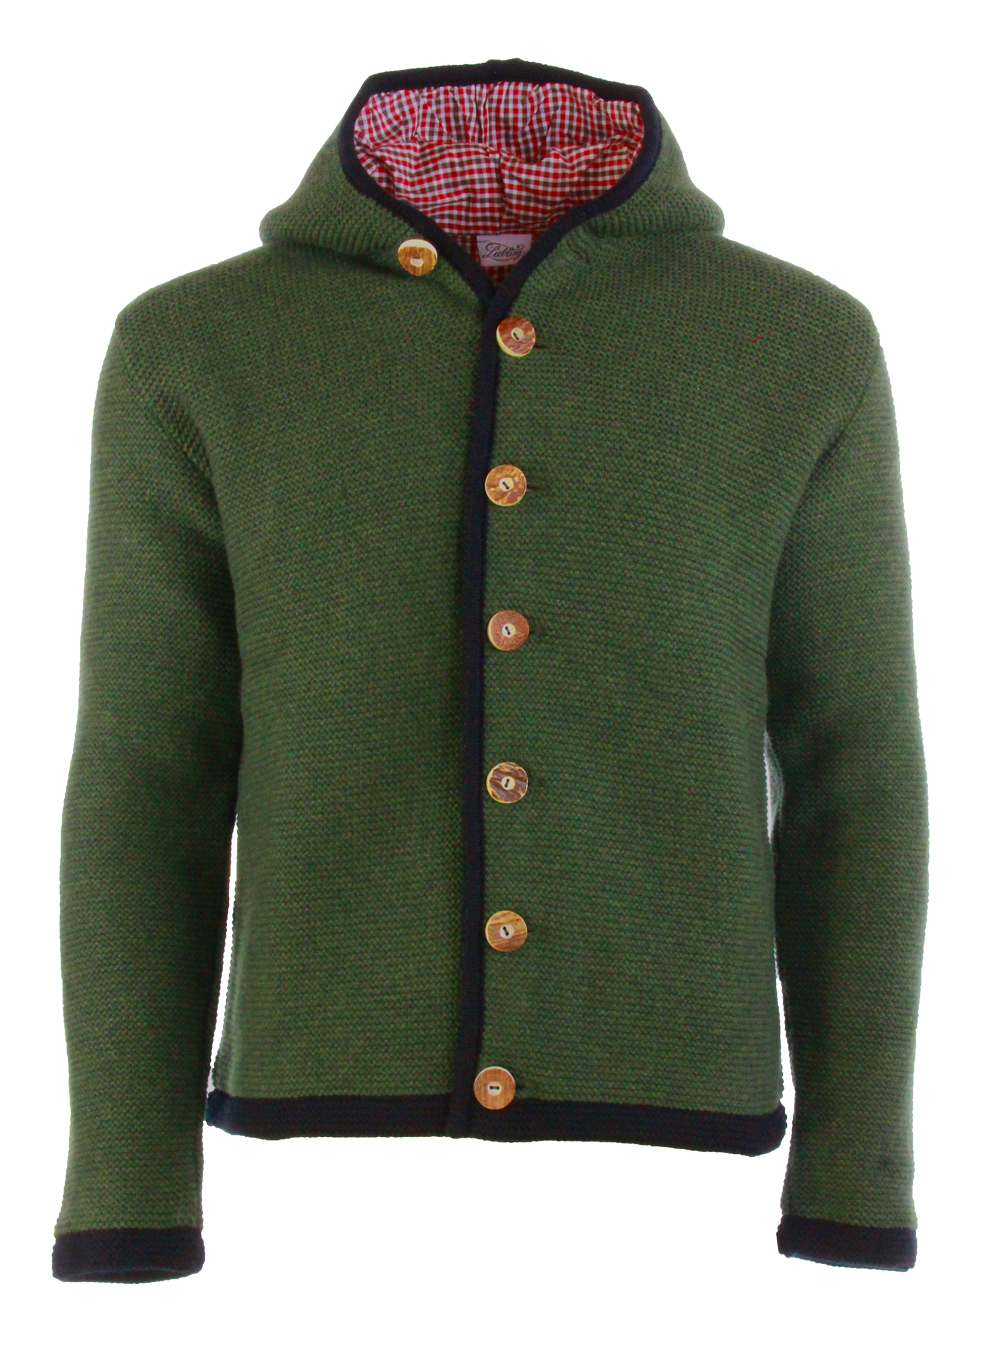 Liebling Tyrolean jacket THOMAS DELUXE GRÜN